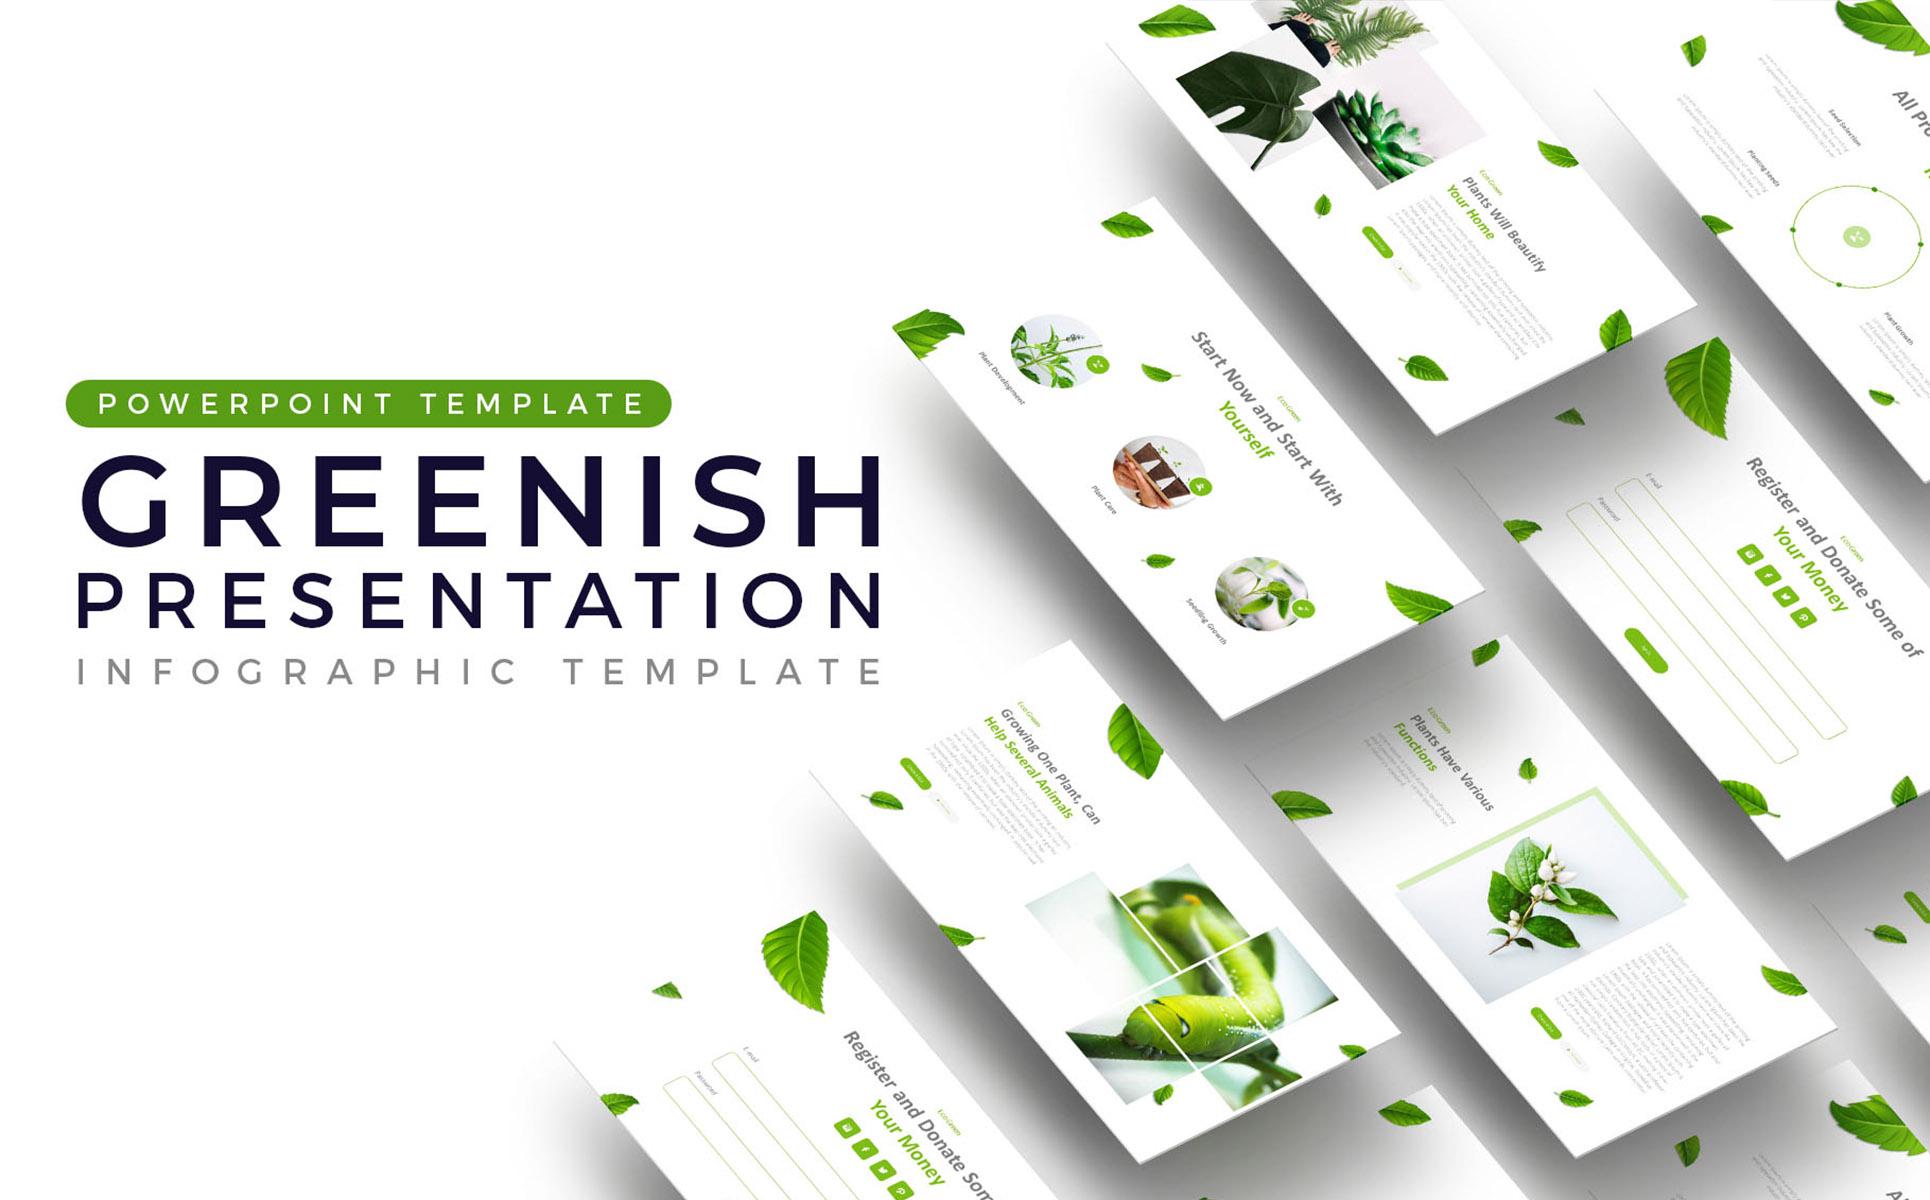 https://s3u.tmimgcdn.com/1633126-1572882413224_Greenish%20Presentation%20Template.jpg